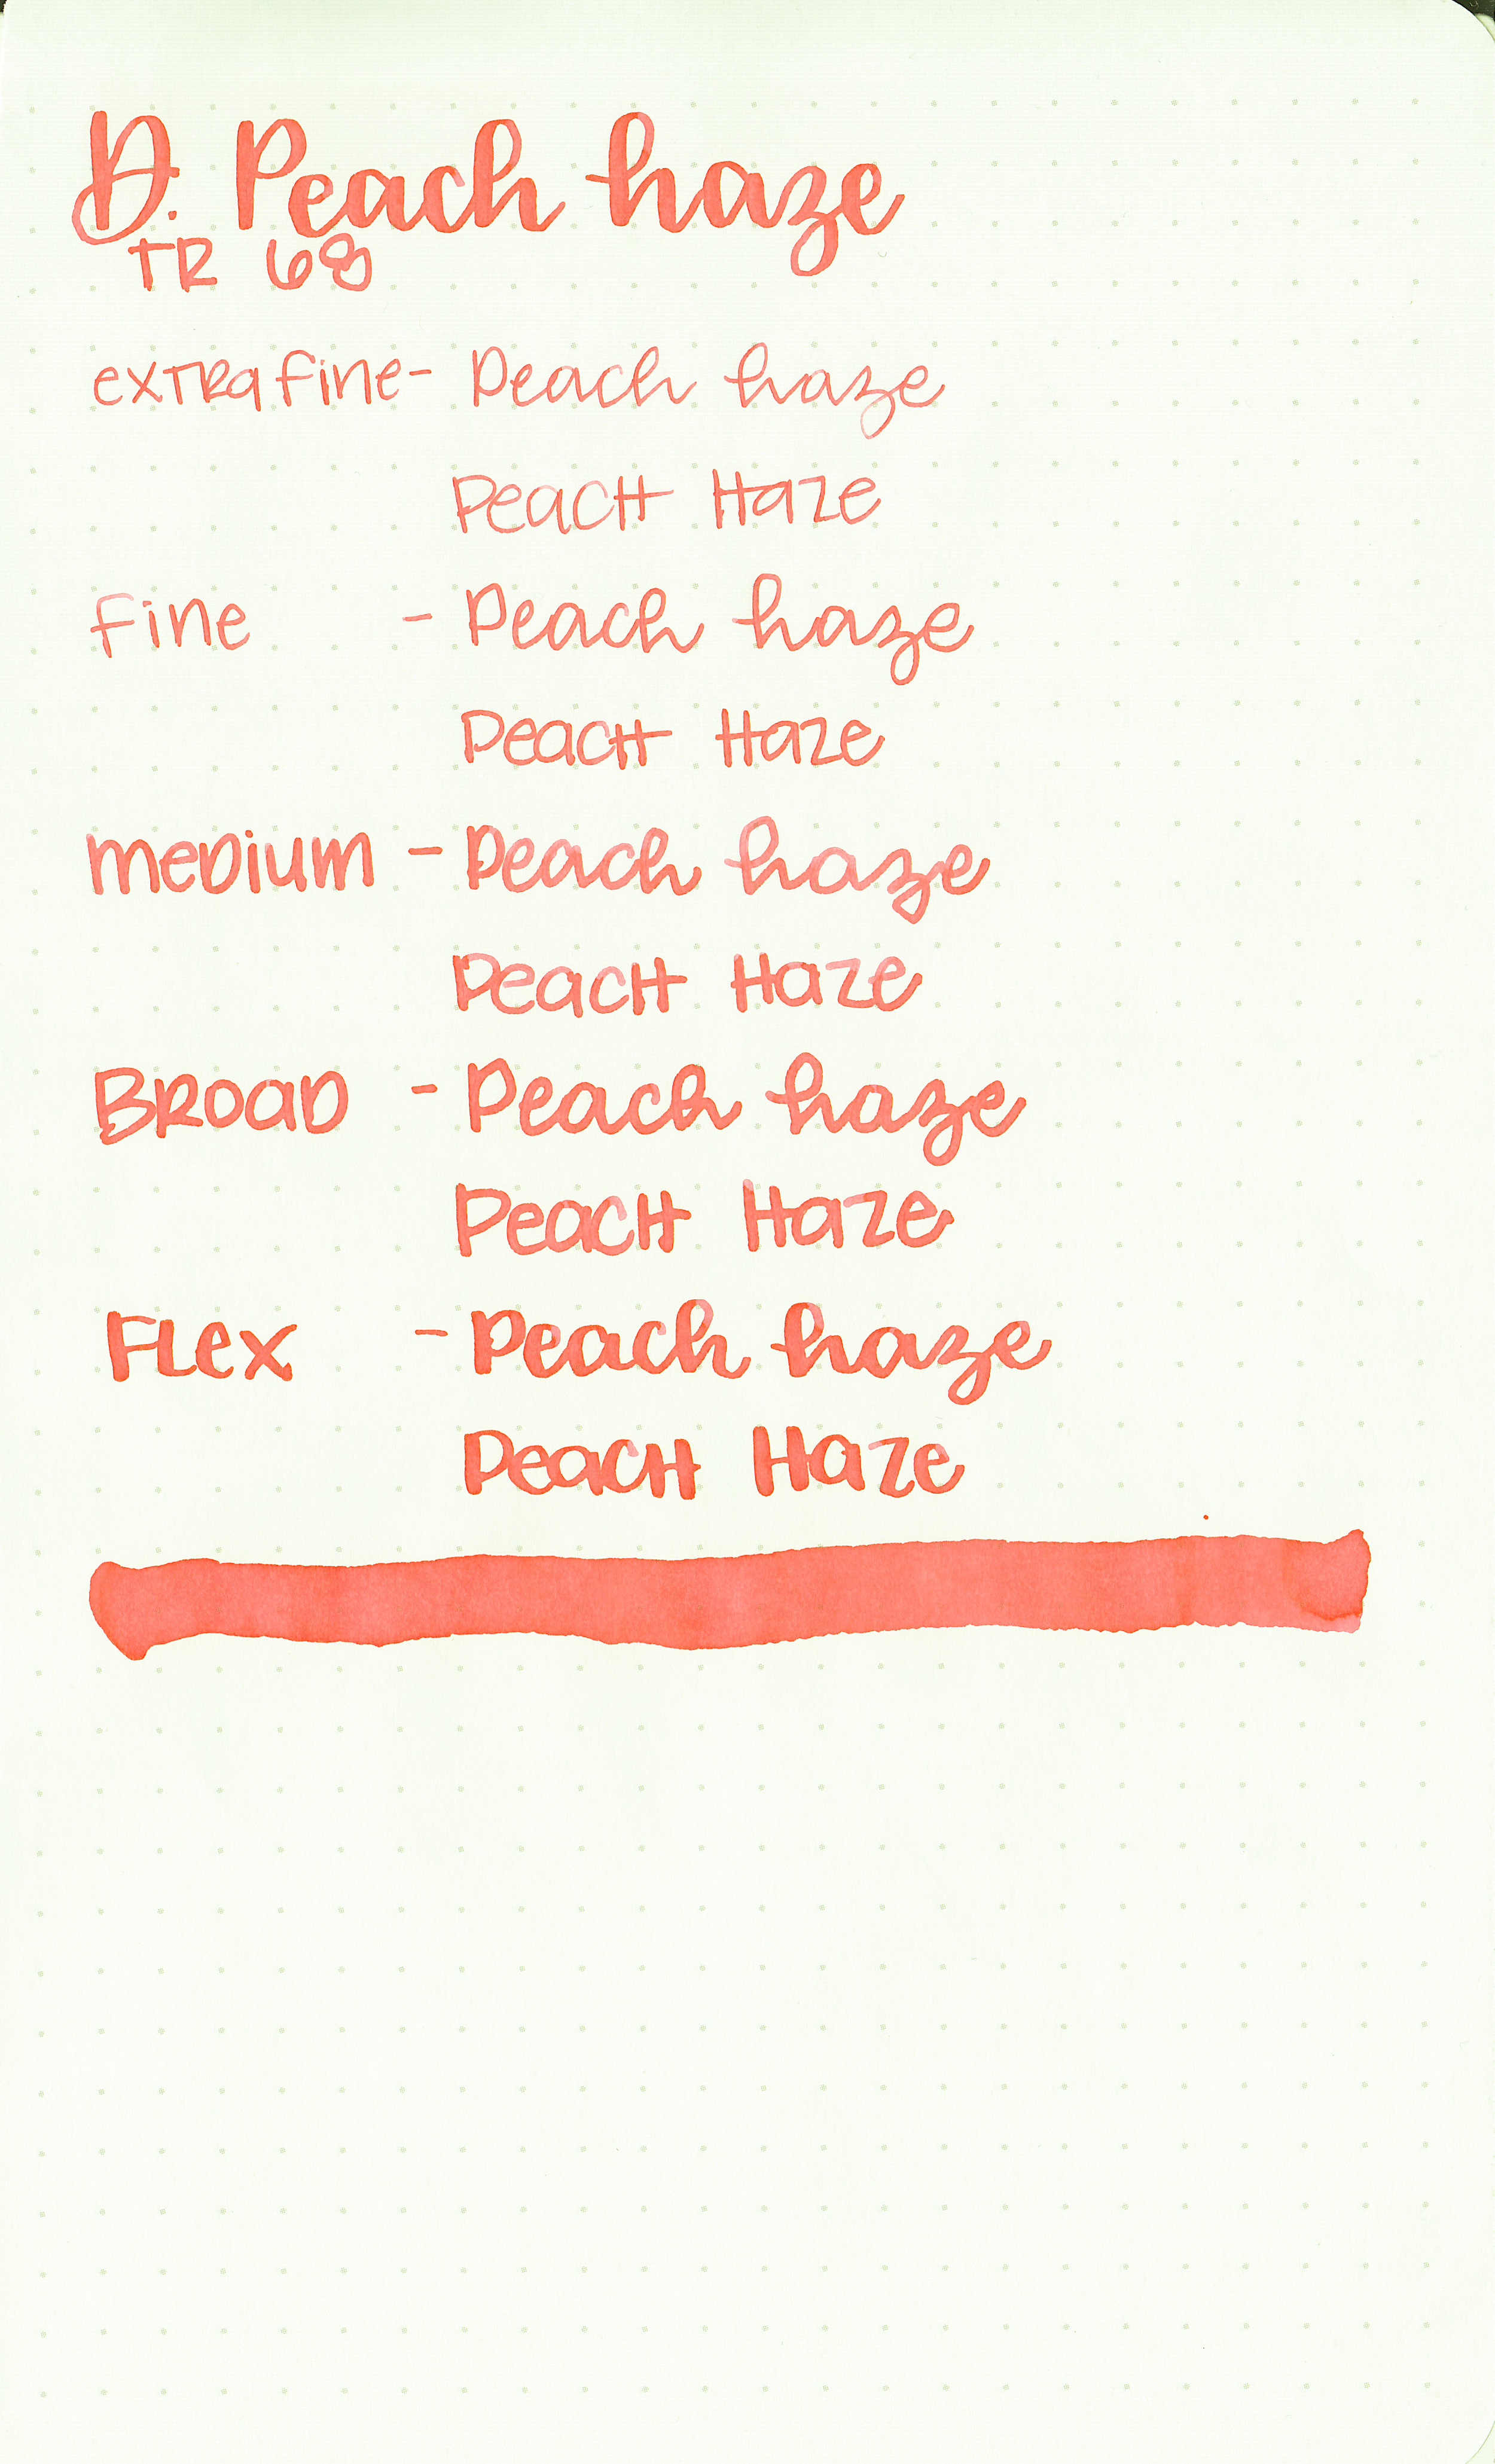 d-peach-haze-9.jpg